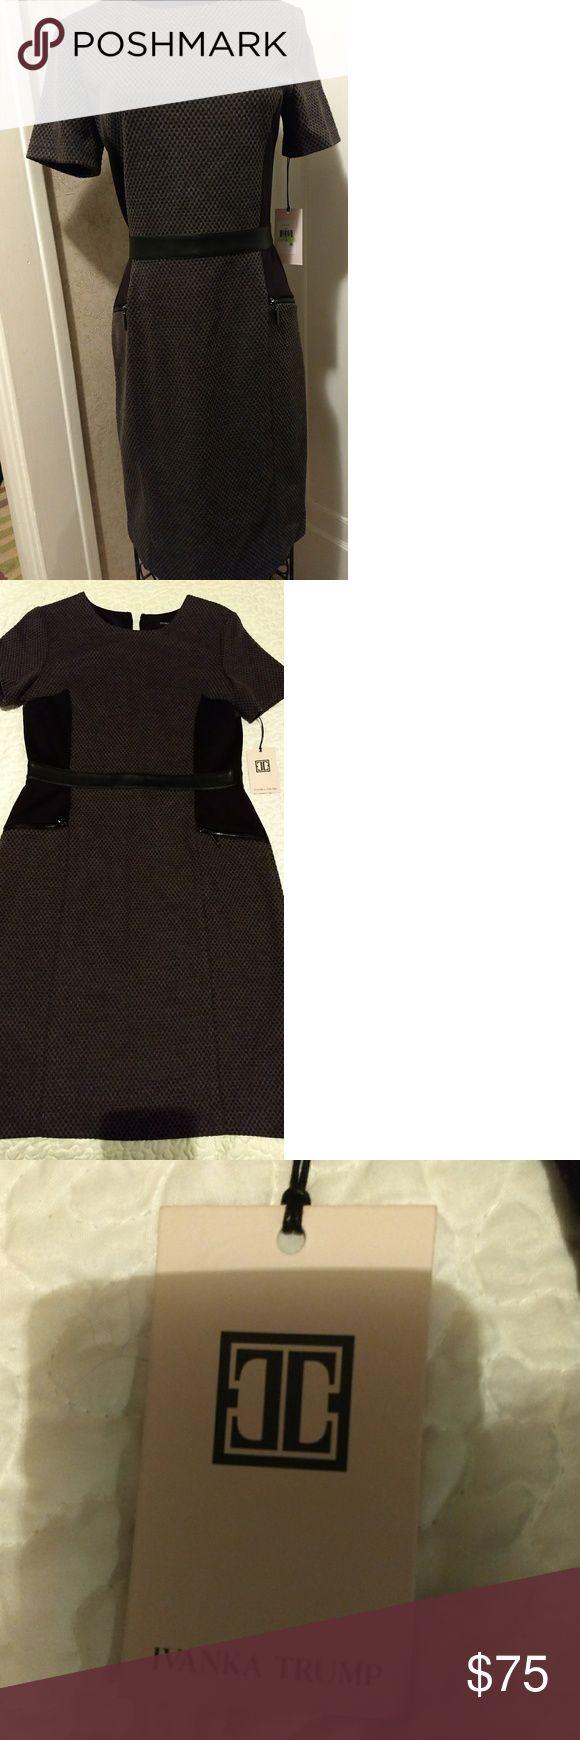 Ivanka Trump Dress Ivanka Trump Dress, figure flattering, with decorative zippers at hips, faux leather at waist, zipper in back, NWT, never worn. Ivanka Trump Dresses